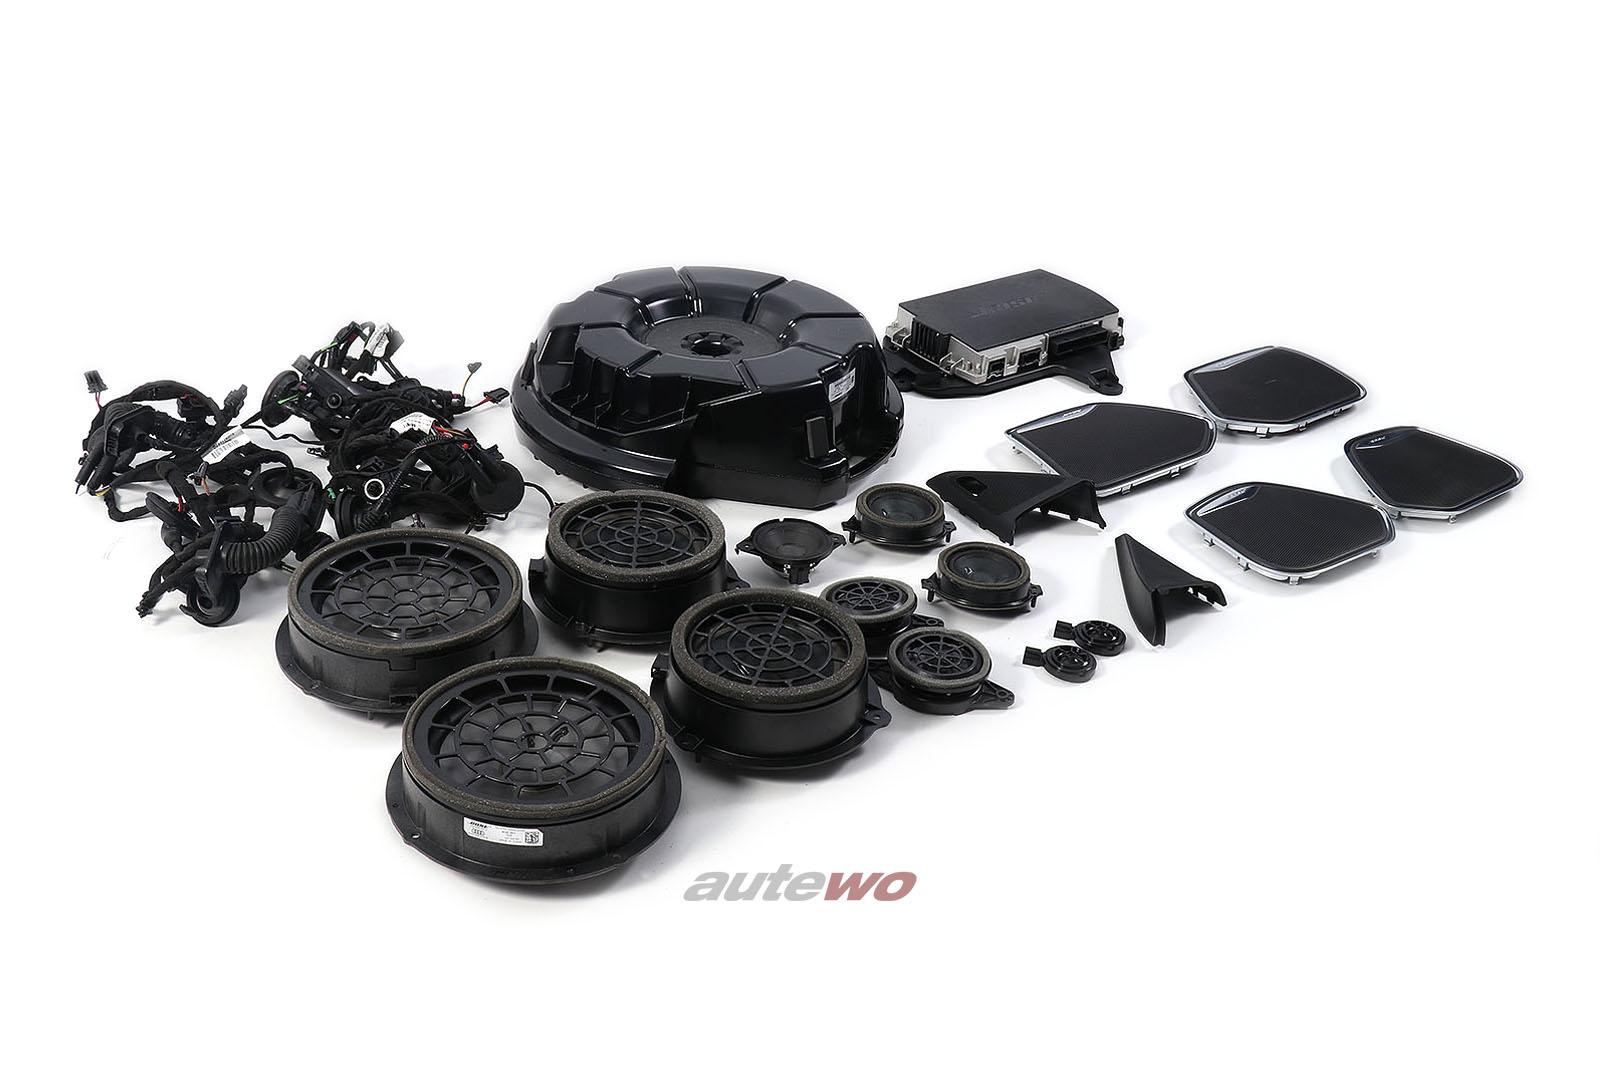 Audi Q3/RSQ3 8U BOSE-Soundsystem Lautsprecher/Subwoofer/Verstärker